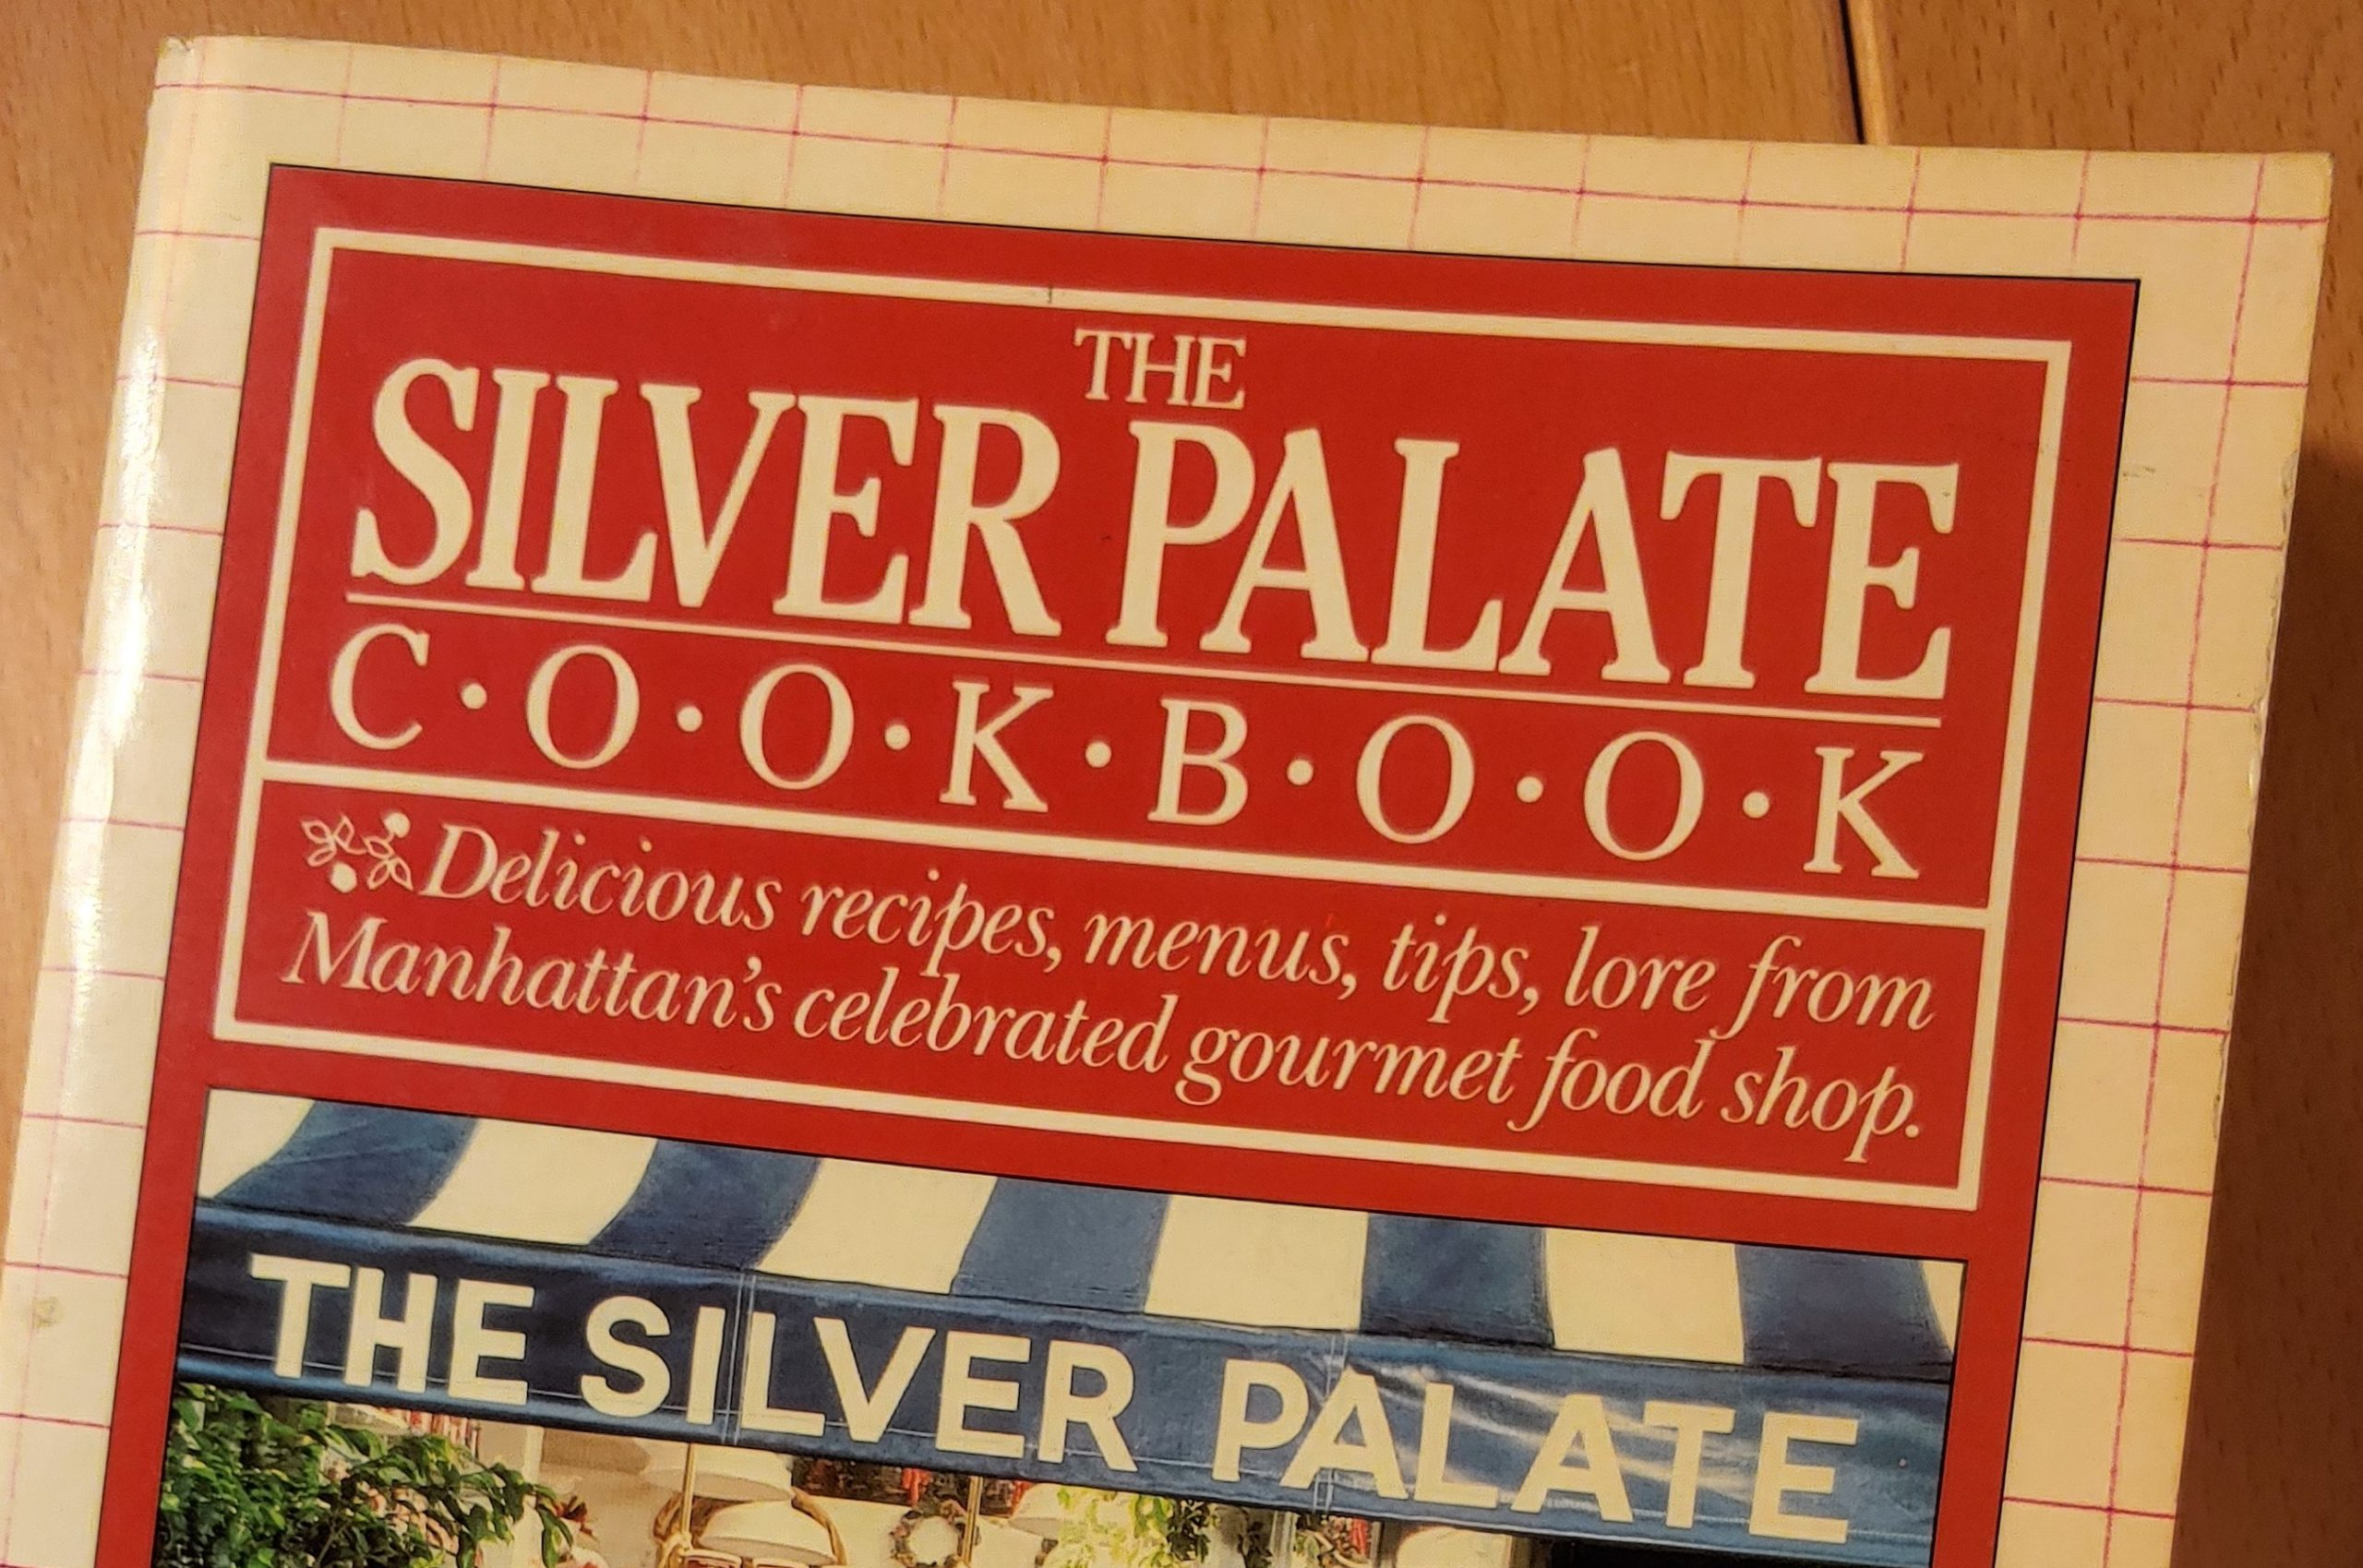 Revisiting Silver Palate